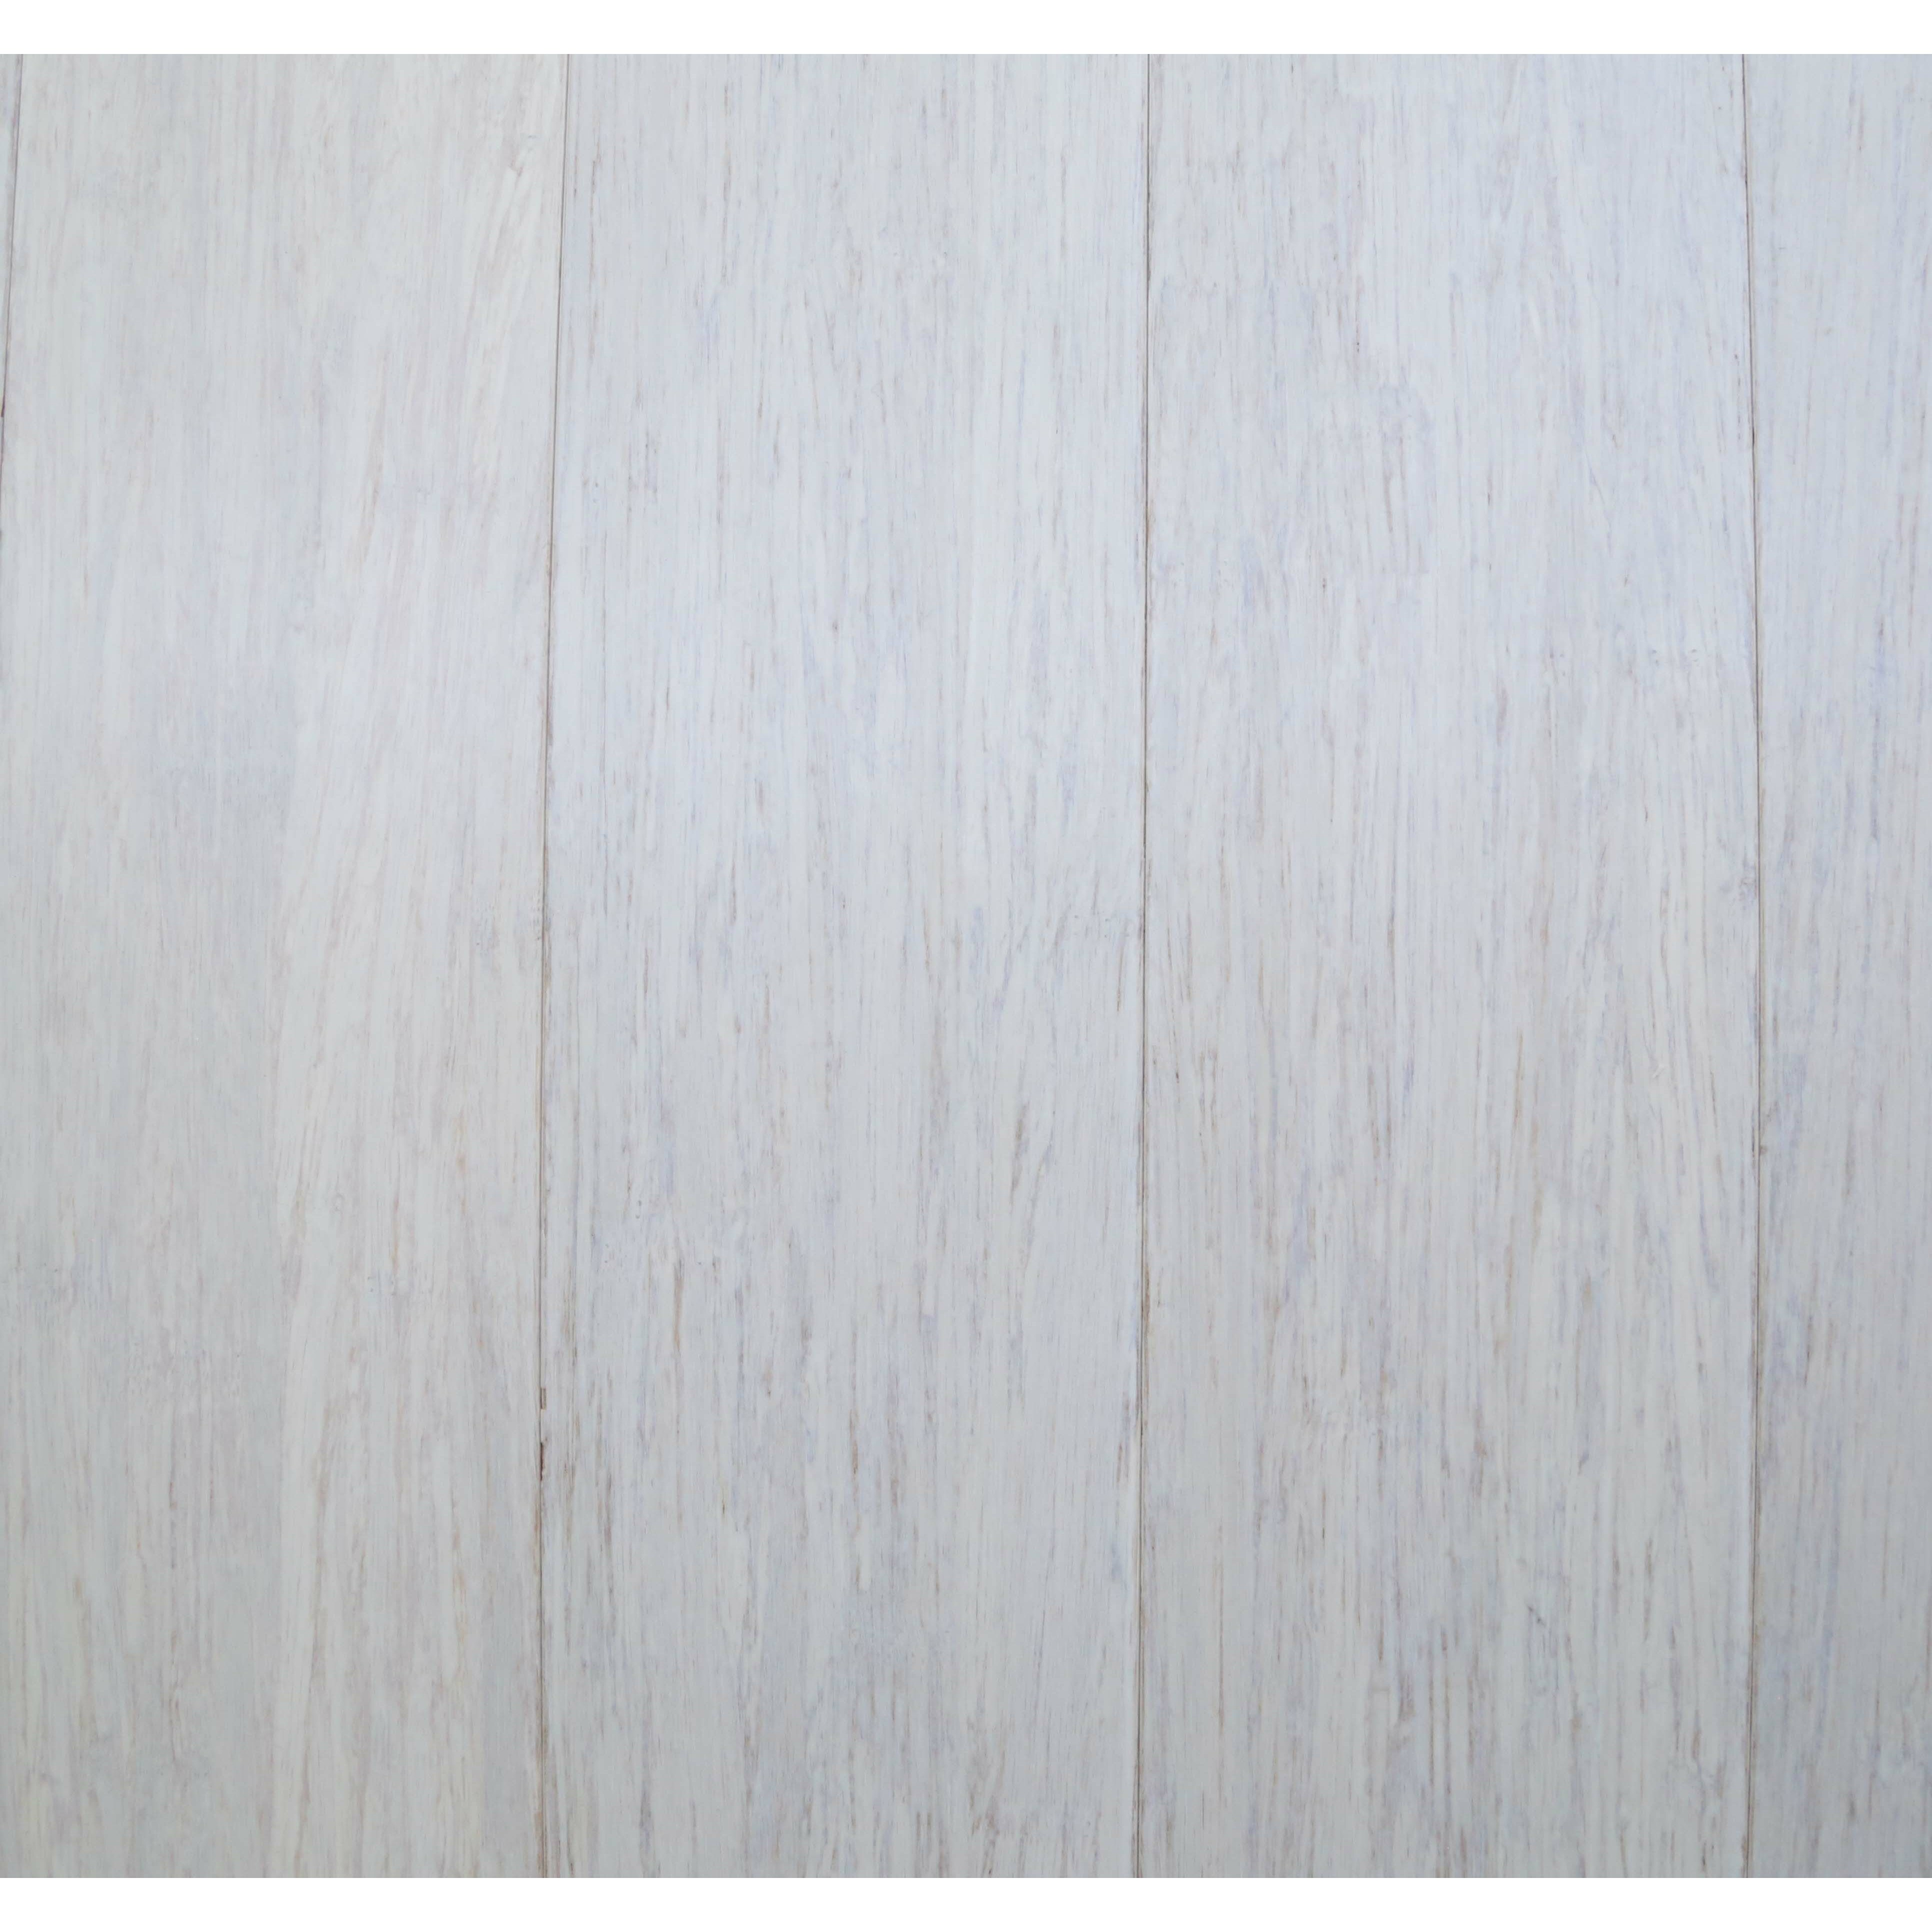 "Installing 5 8 Inch Bamboo Flooring: Islander Flooring 3-5/8"" Solid Bamboo Hardwood Flooring In"